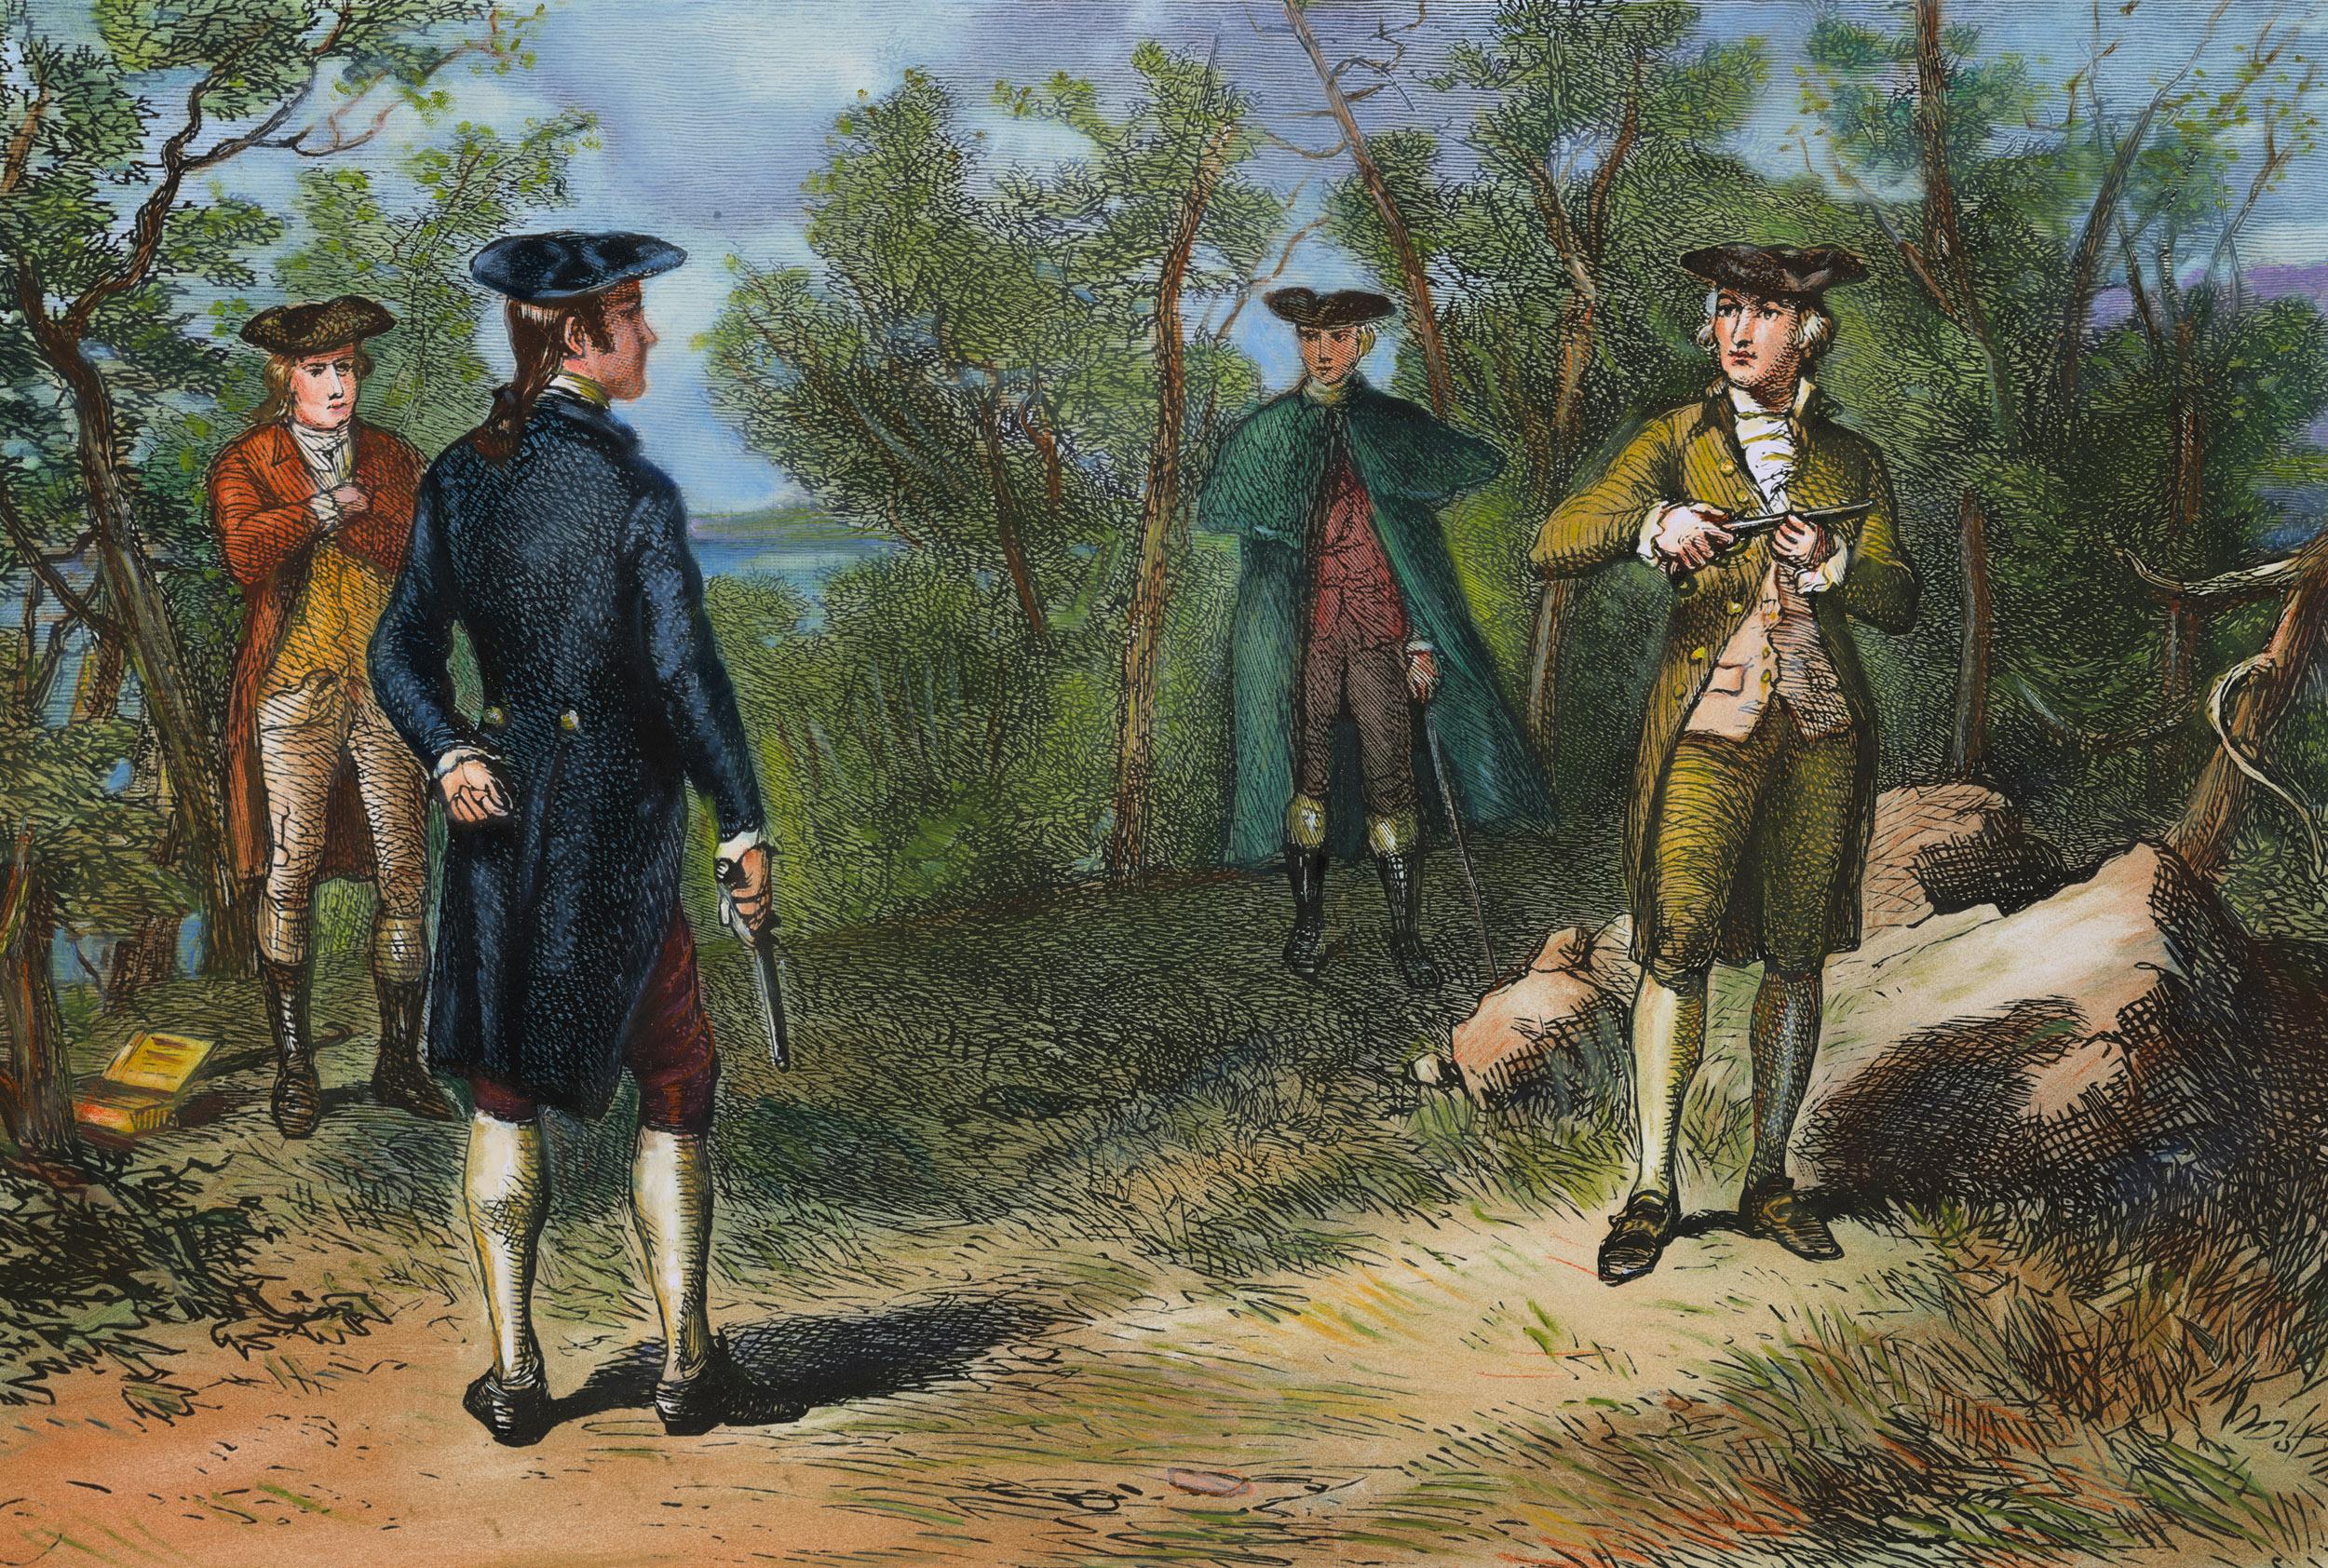 alexander hamilton and aaron burr duel